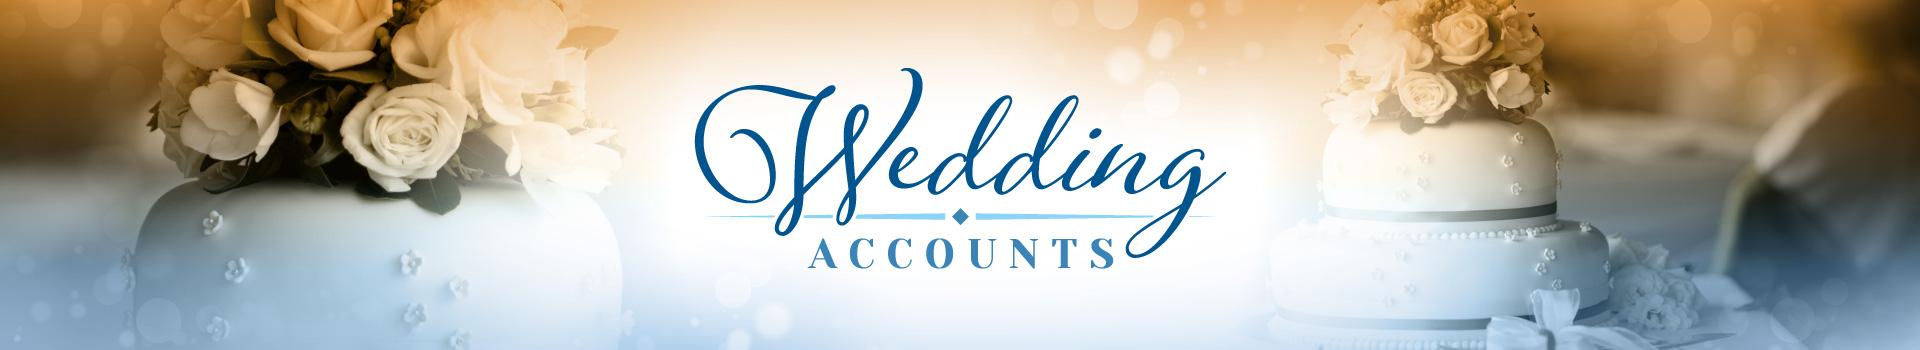 Wedding Savings Accounts America First Credit Union